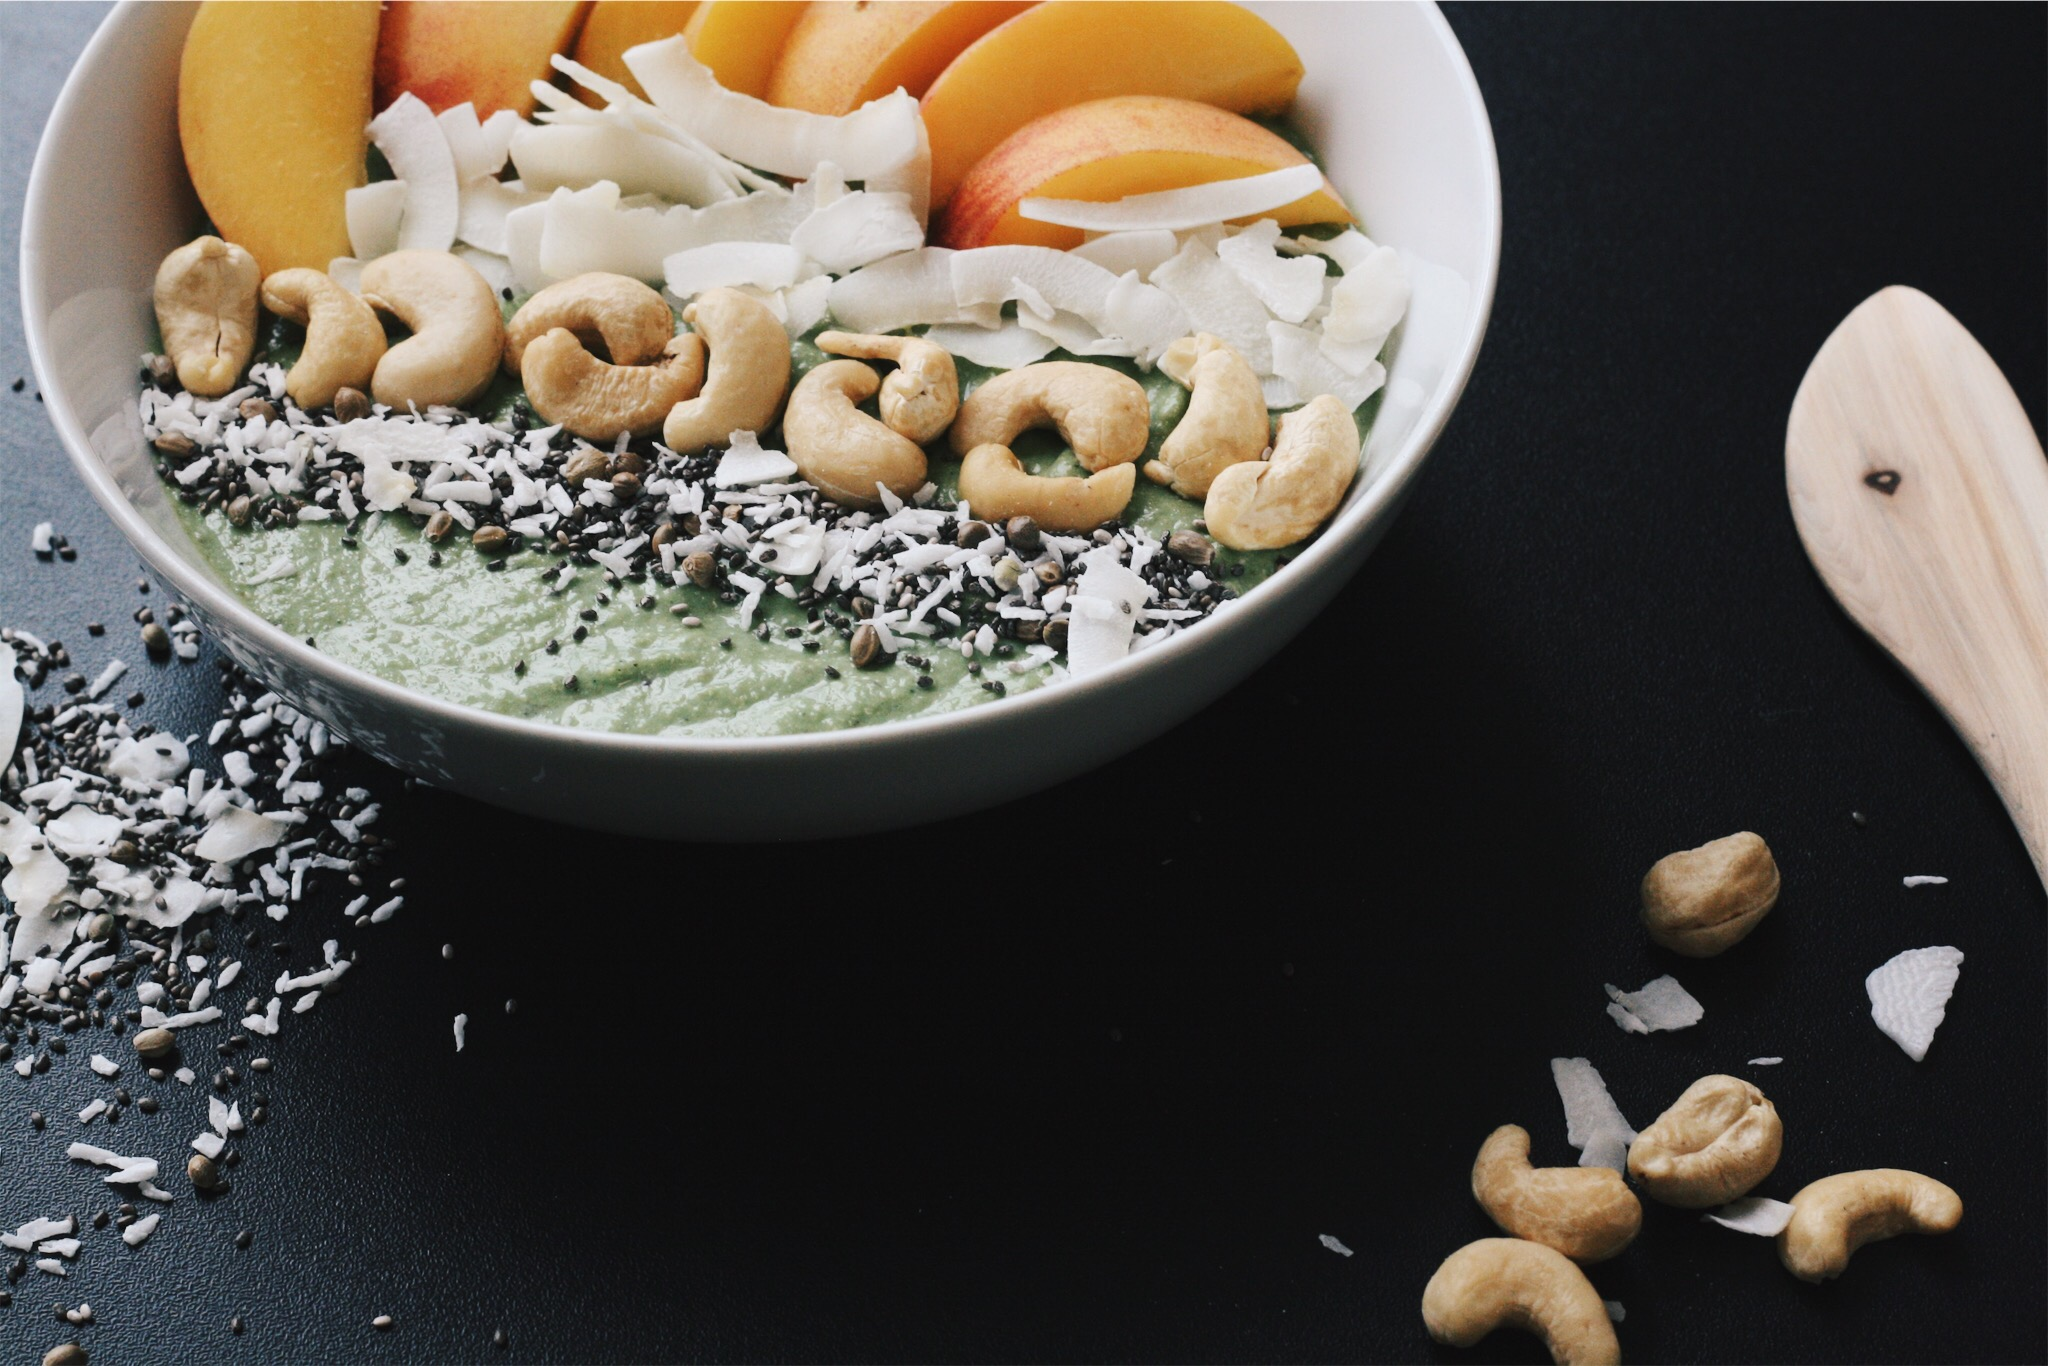 detox-smoothie-bowl